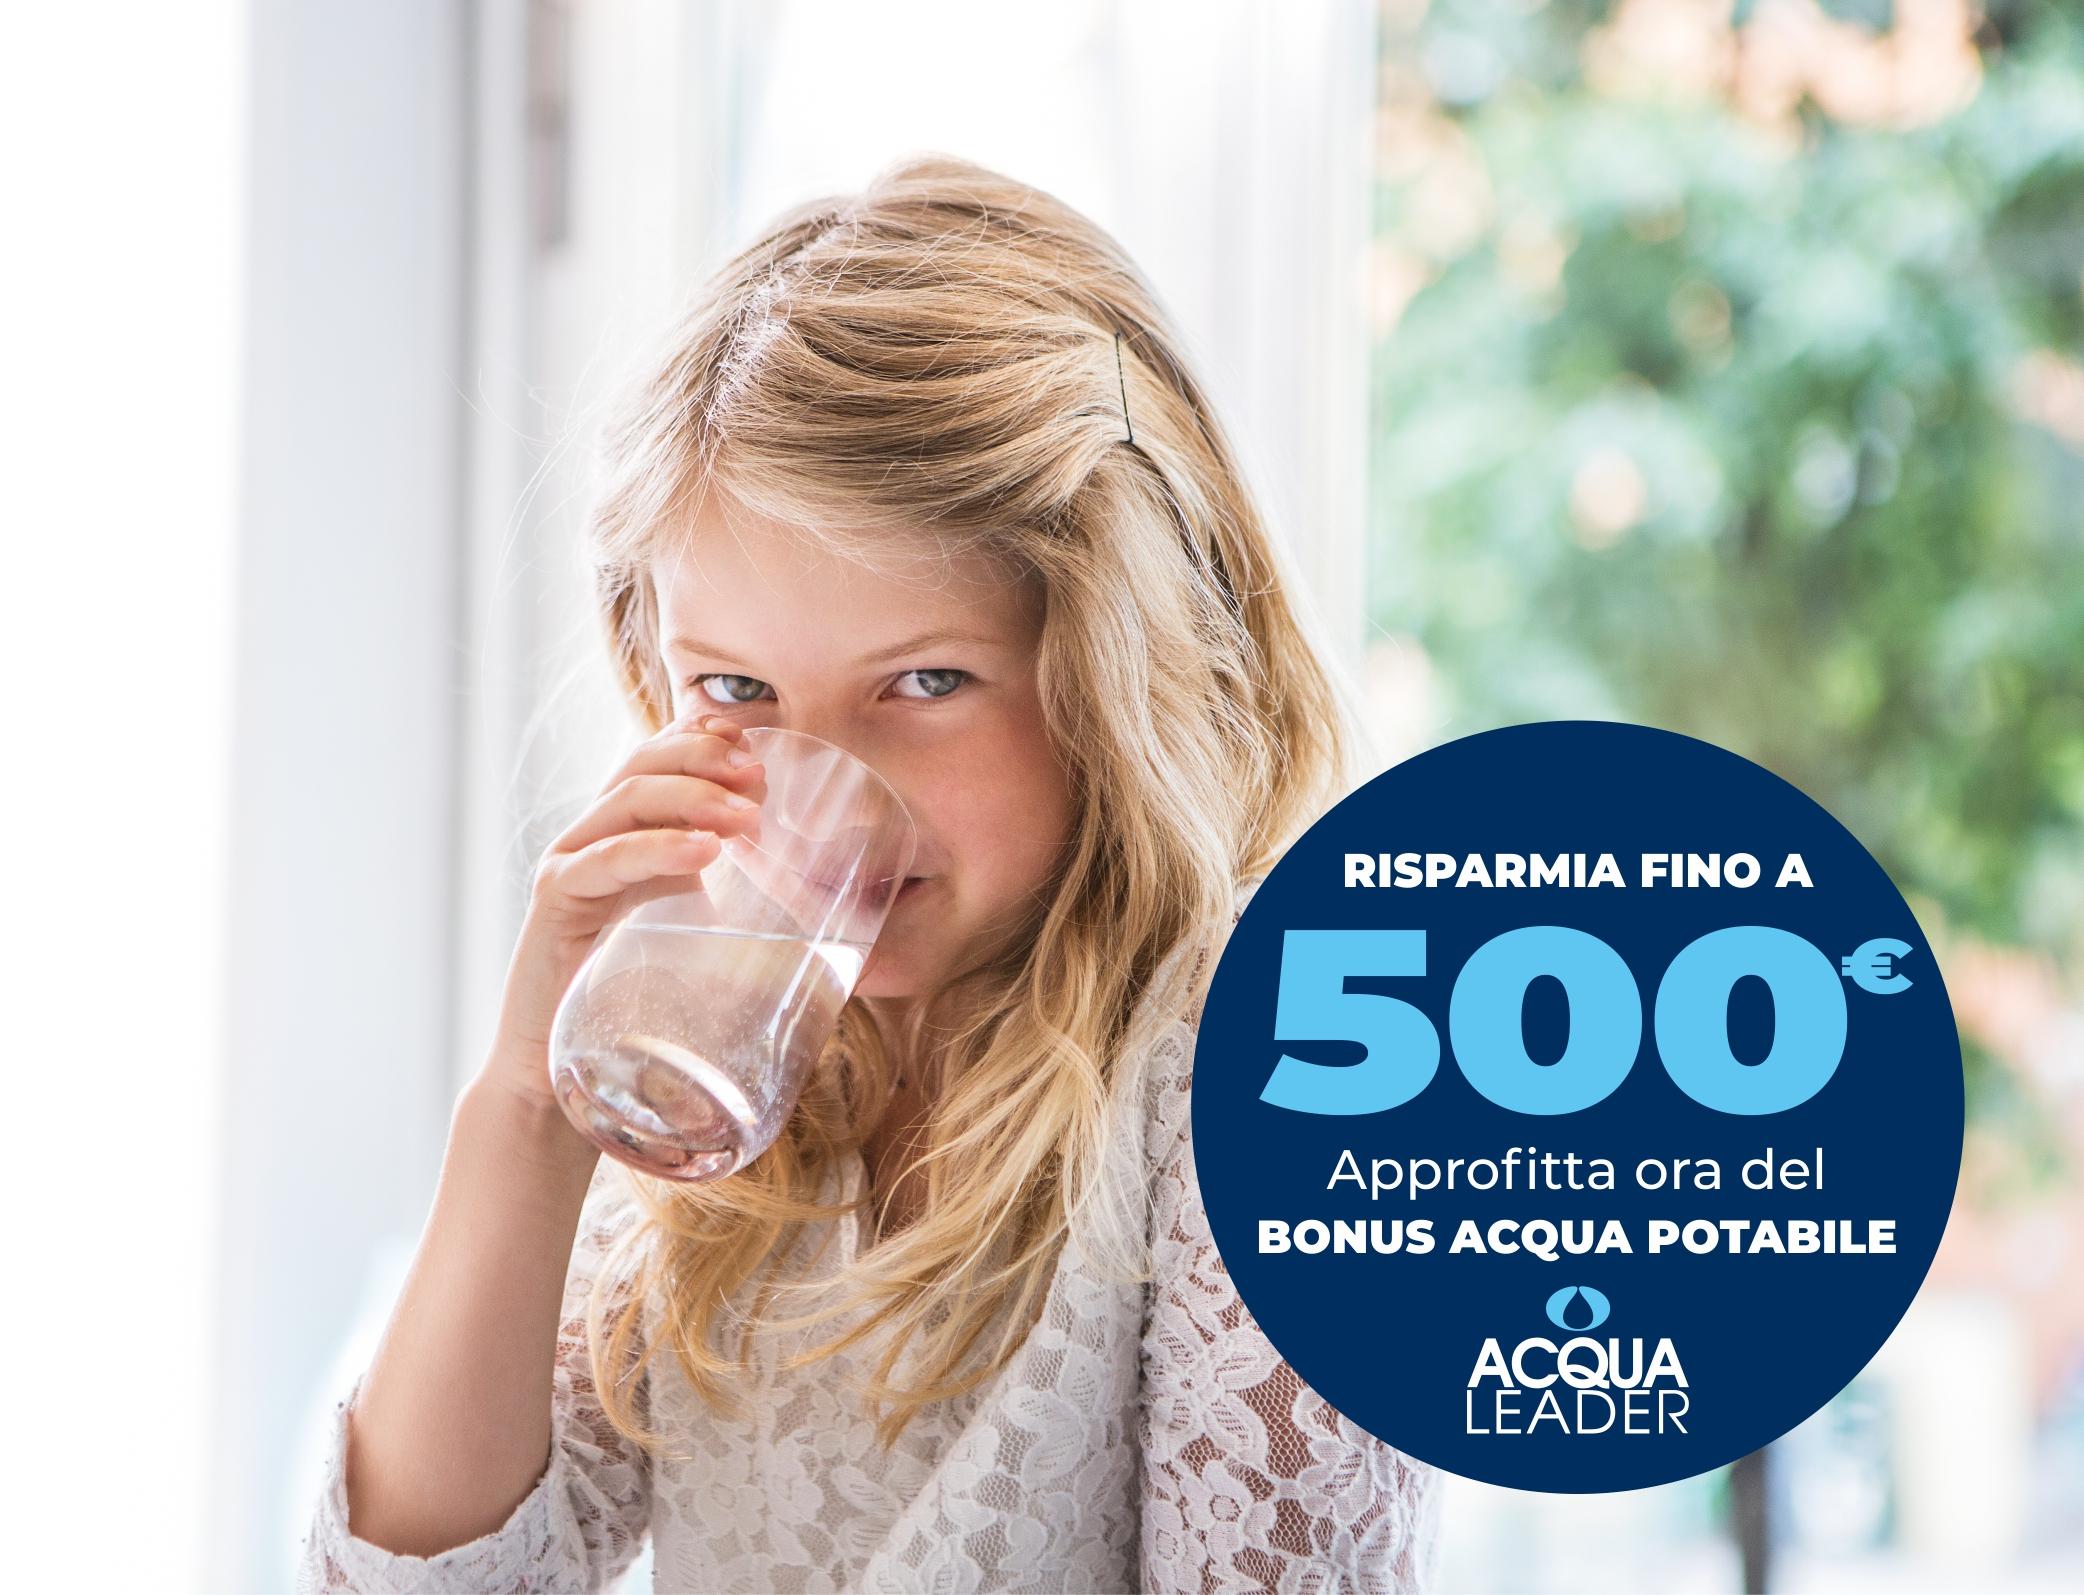 bonus acqua potabile